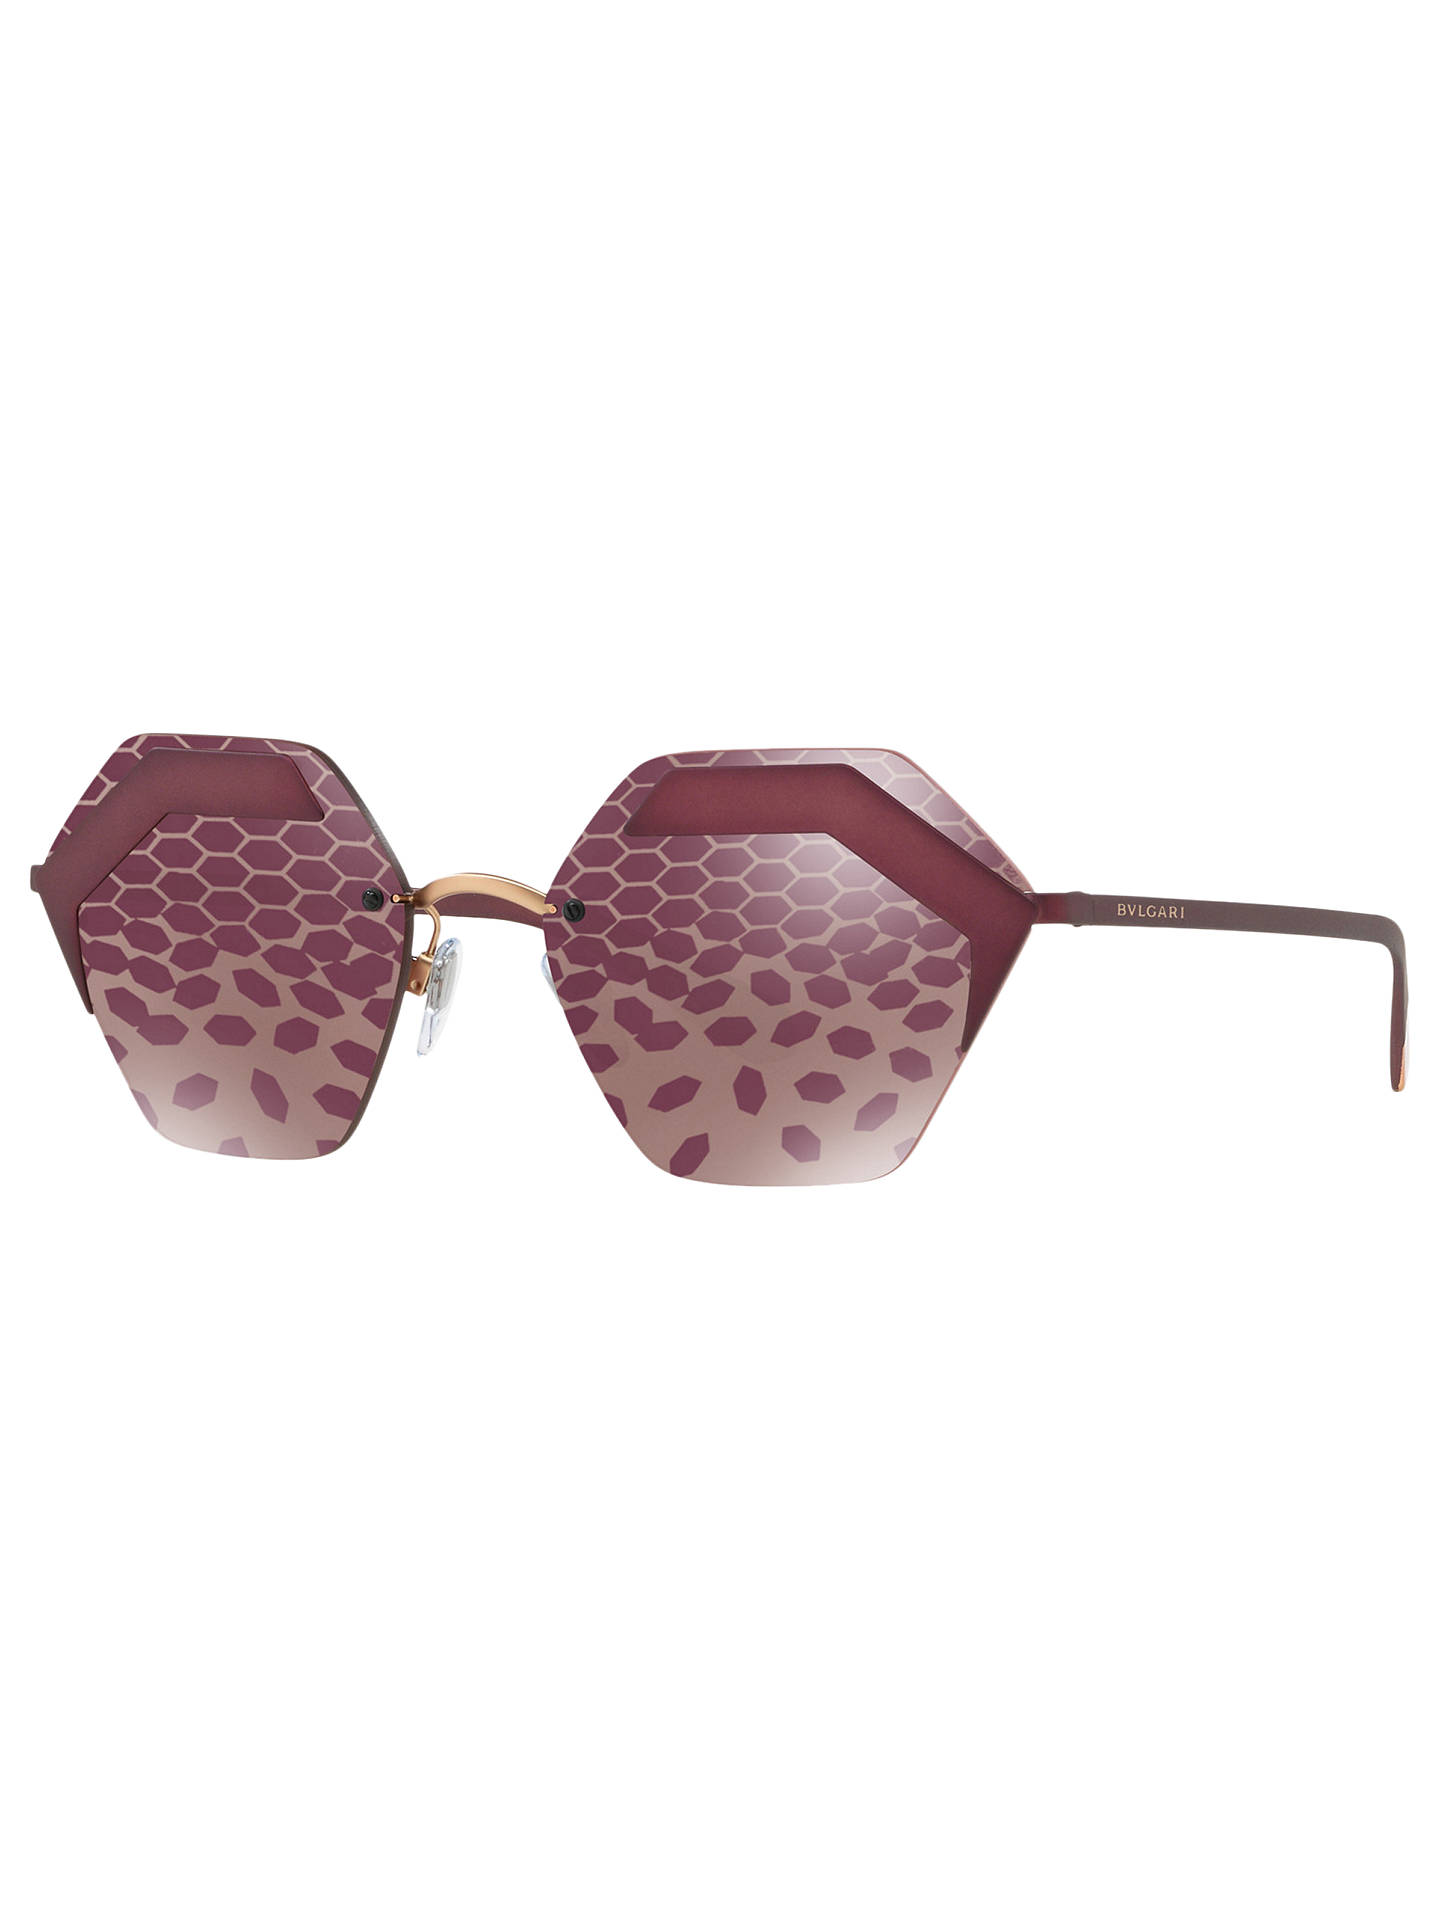 5de55992300 Buy BVLGARI BV6089 Women s Hexagonal Sunglasses